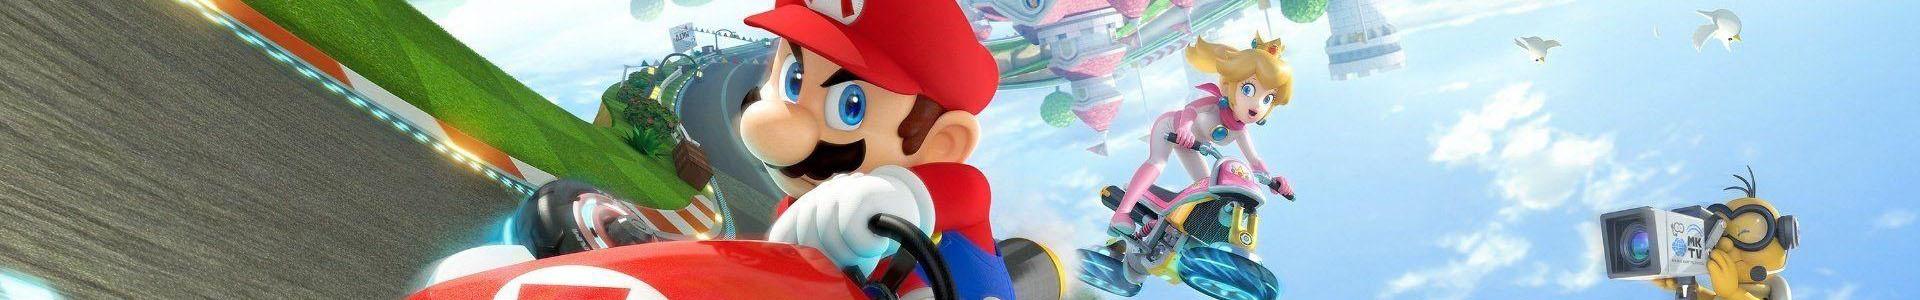 Mario_1.jpg